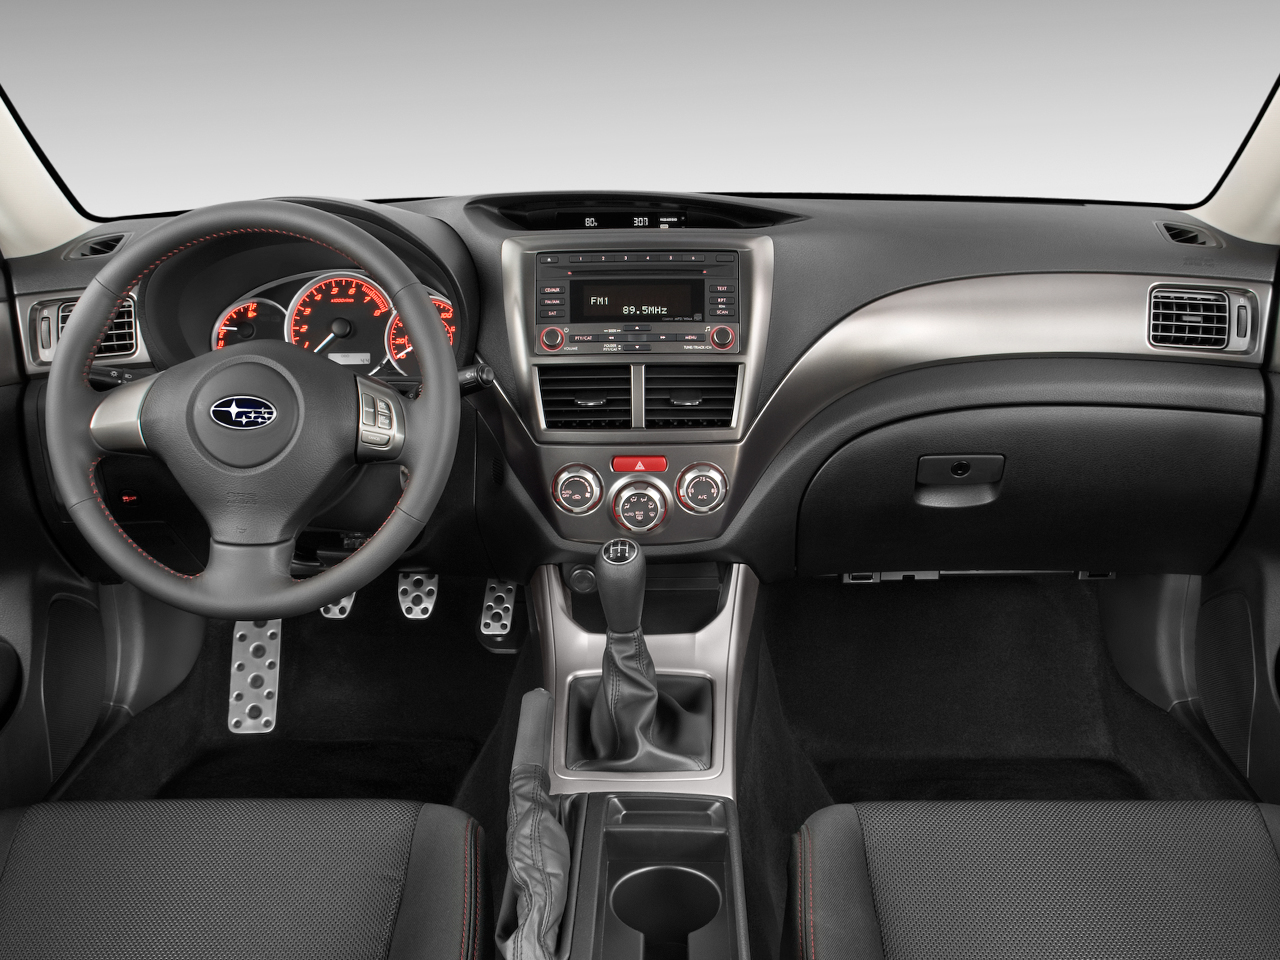 2018 Subaru Impreza Sport Hatchback >> 2009 Subaru Impreza WRX Premium - Subaru Sport Hatchback Review - Automobile Magazine